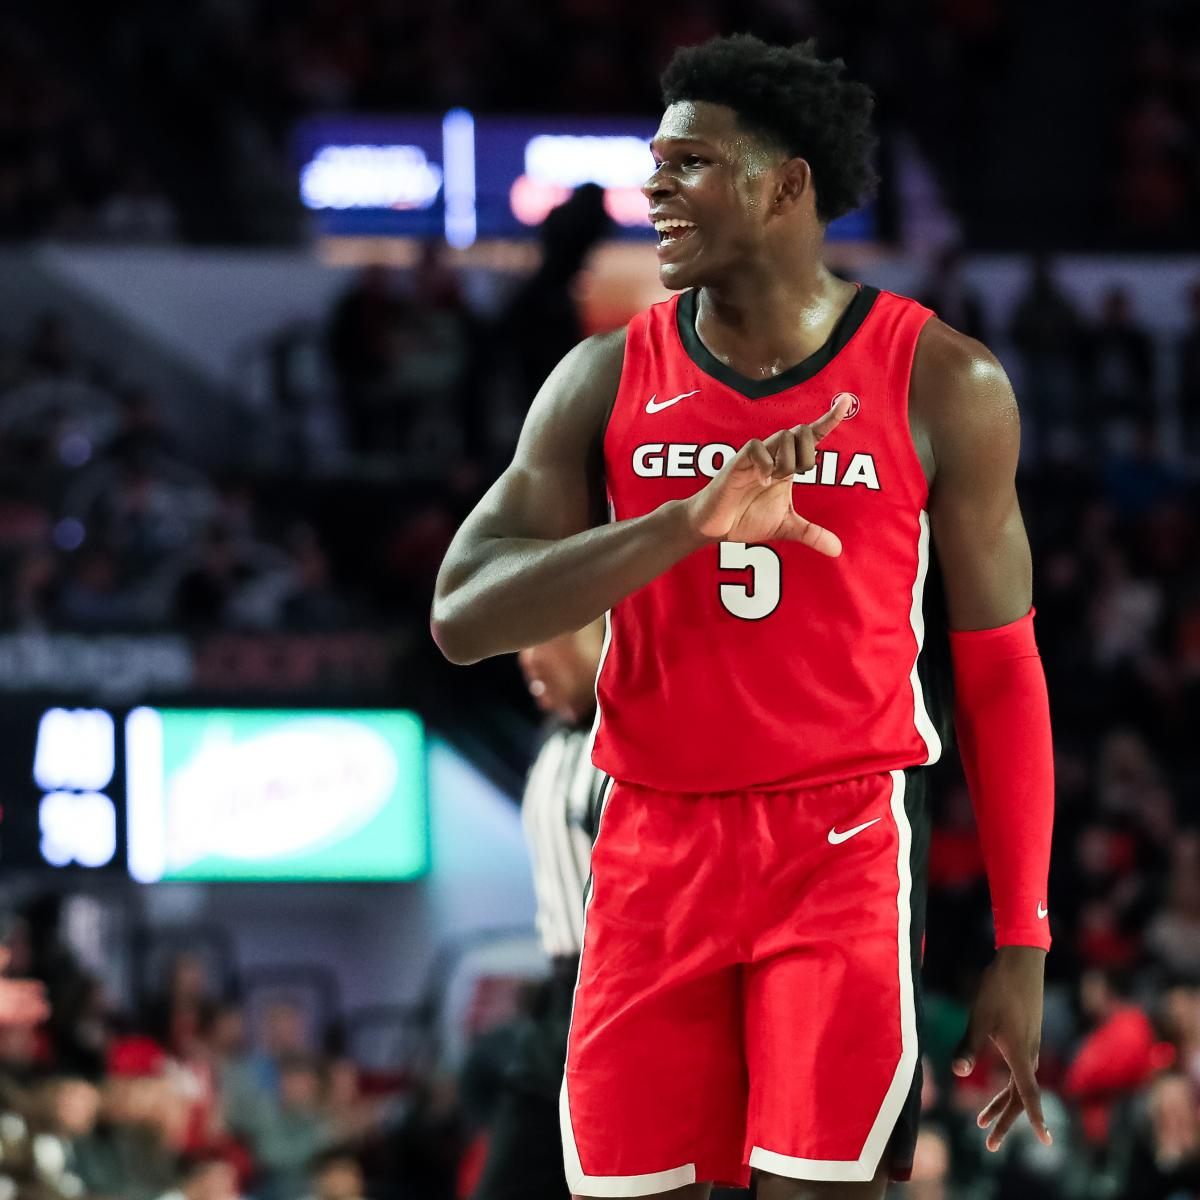 NBA Mock Draft 2020: Landing Spots for Anthony Edwards, Top ROY Prospects